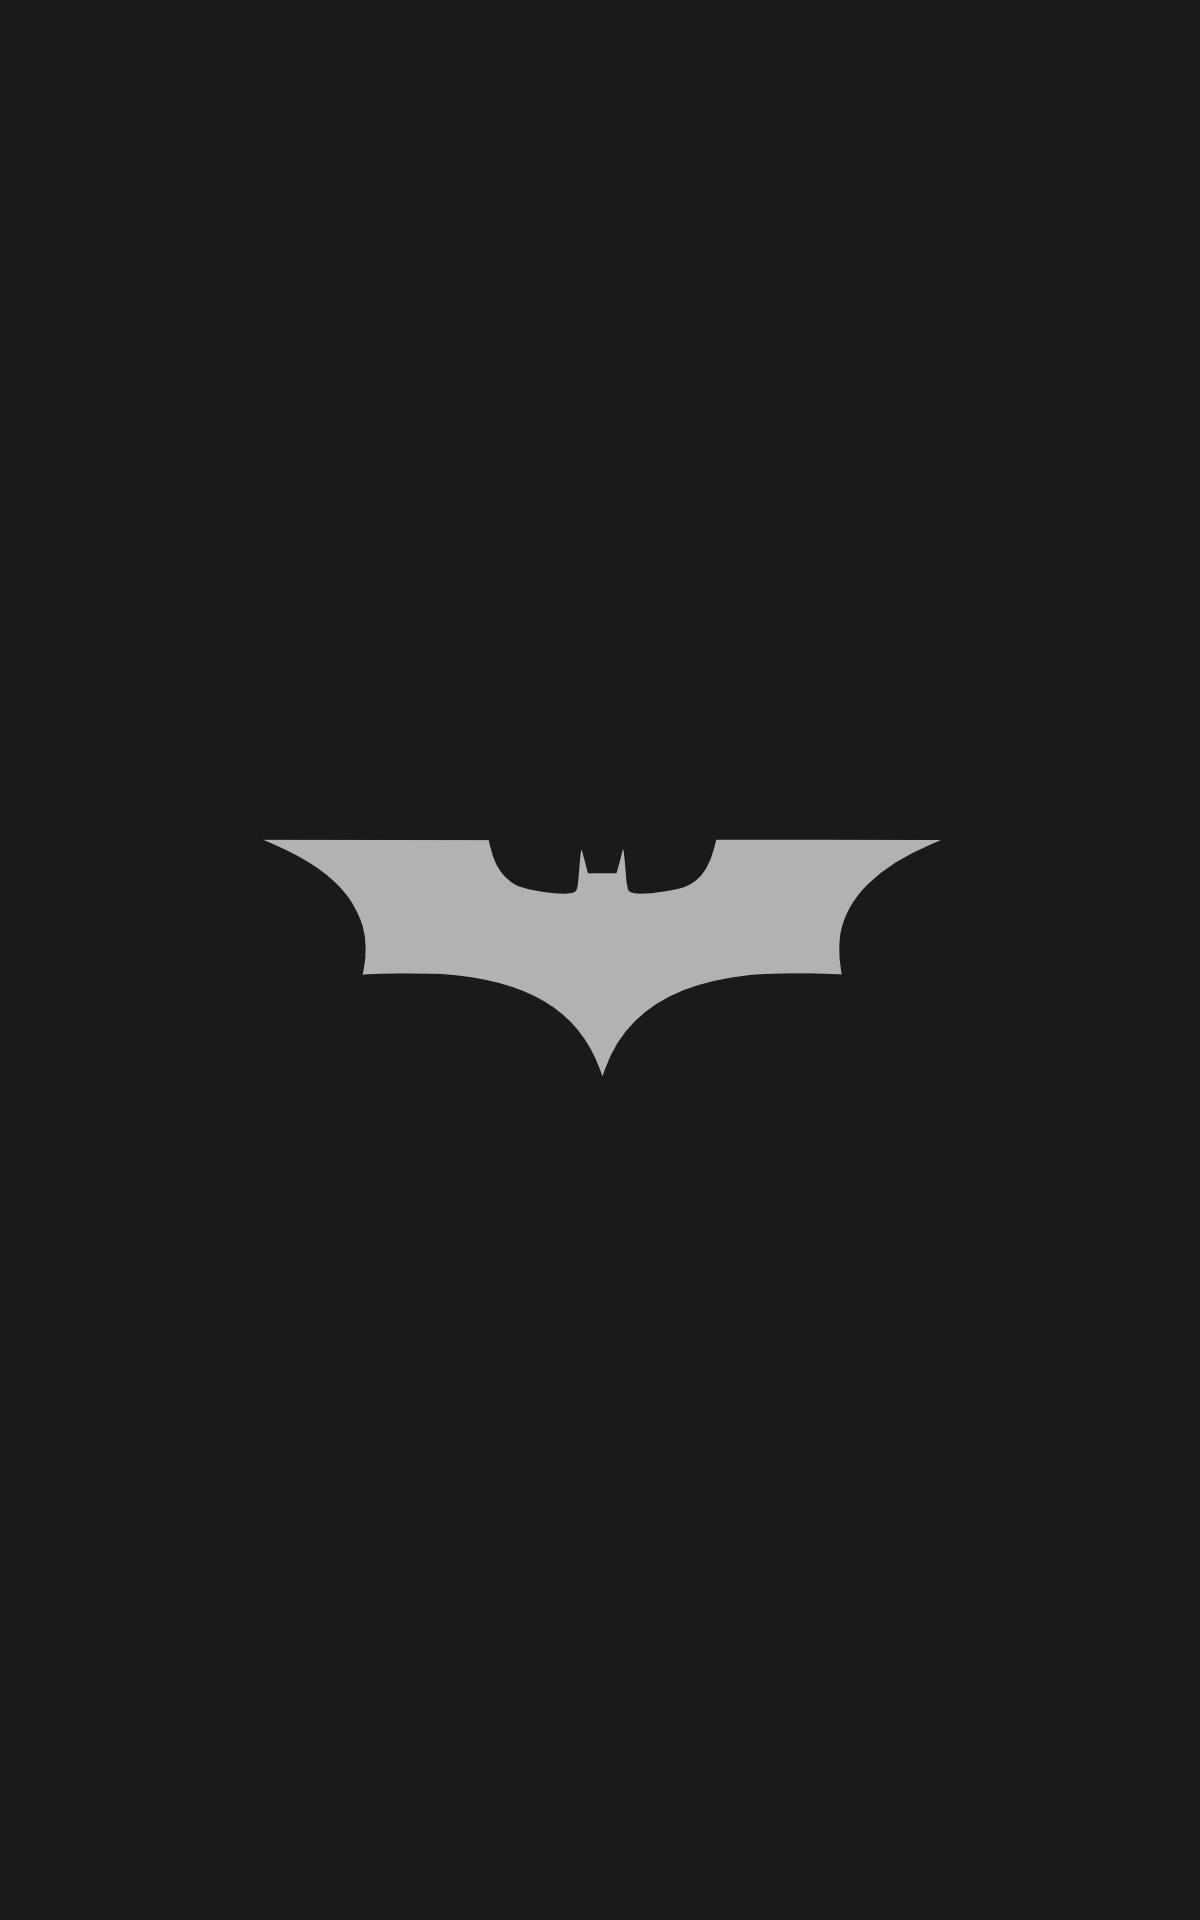 Batman Logo Minimalism Portrait Display